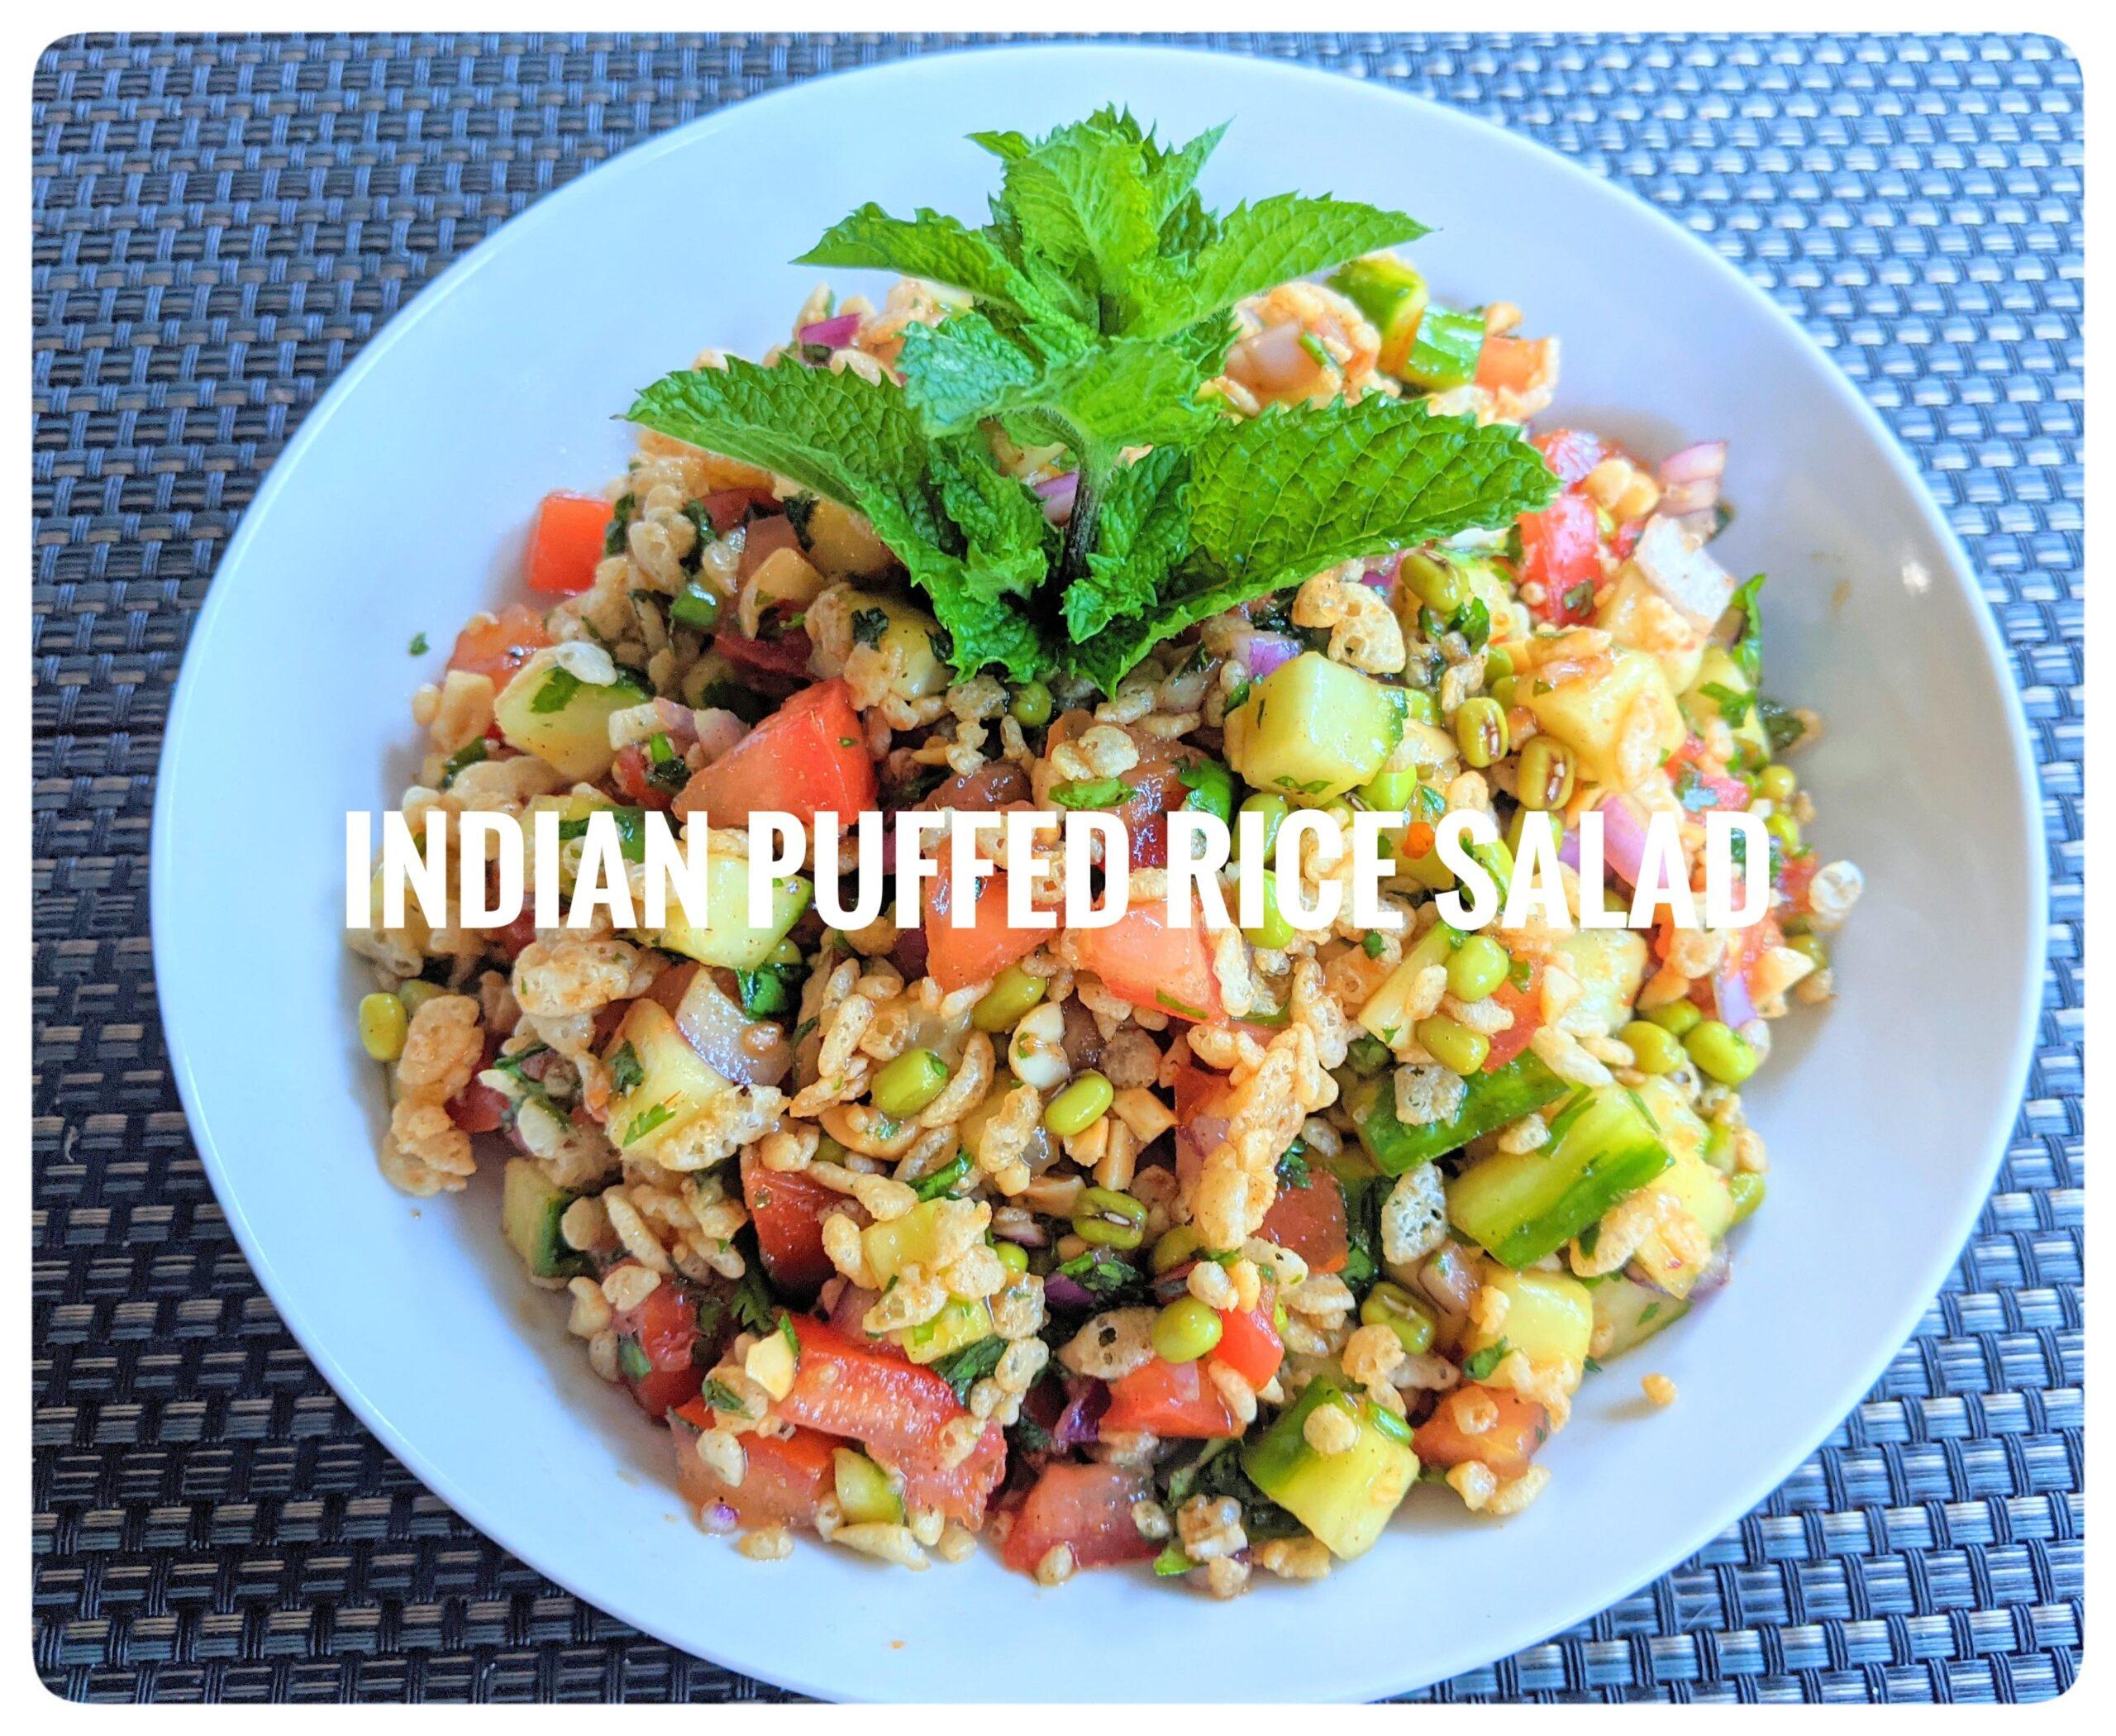 Indian Puffed Rice Salad